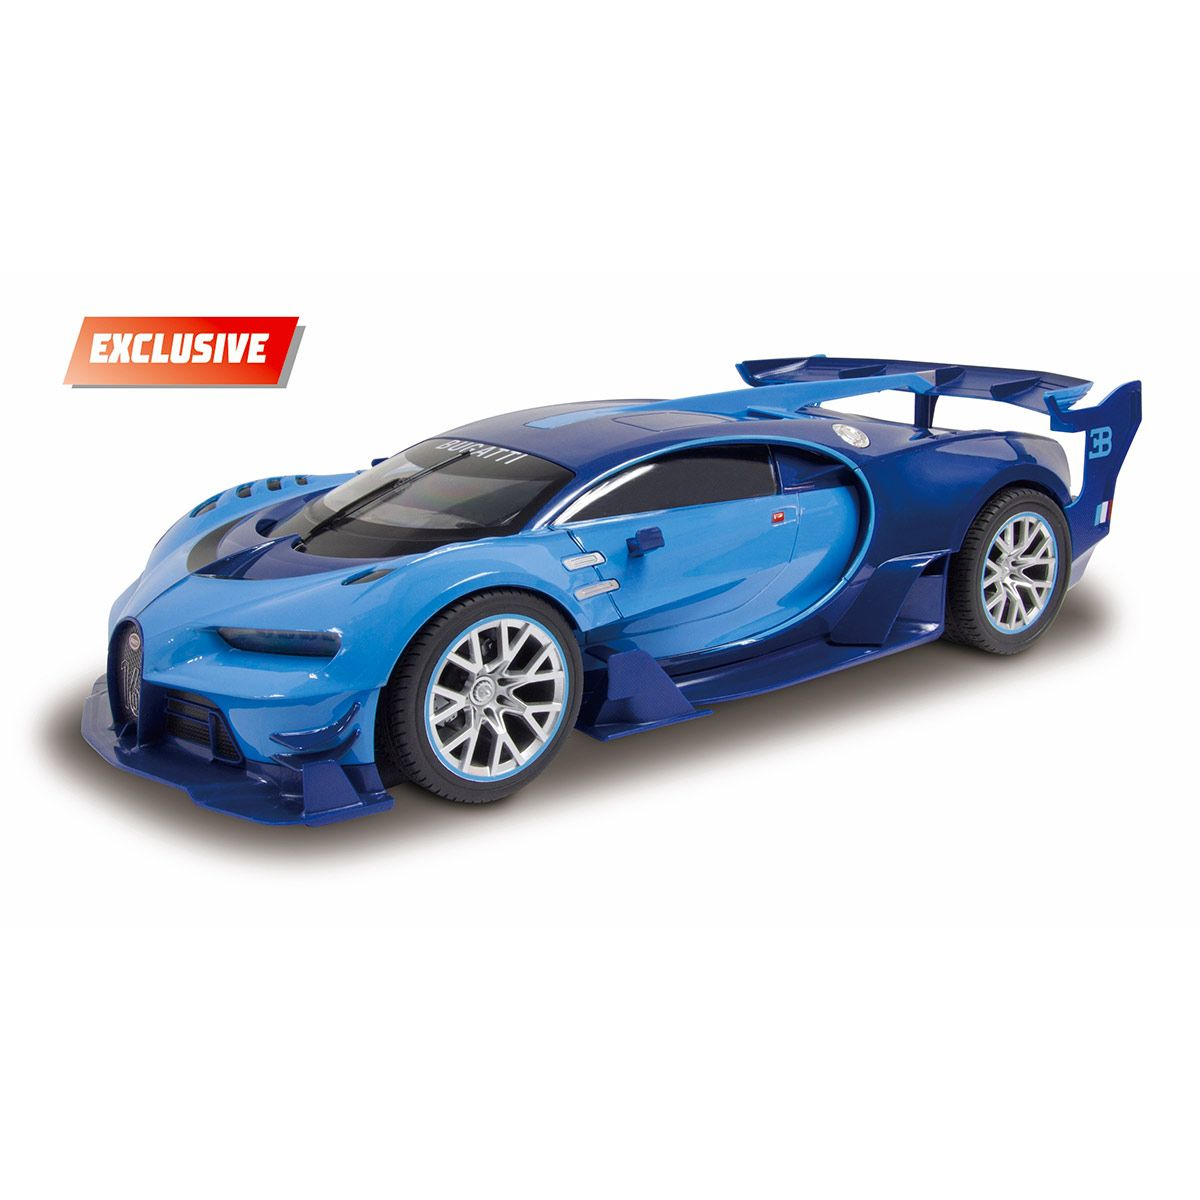 Vision Bugatti 112 Gt Radiocommandée Voitures LqUSpzMVG